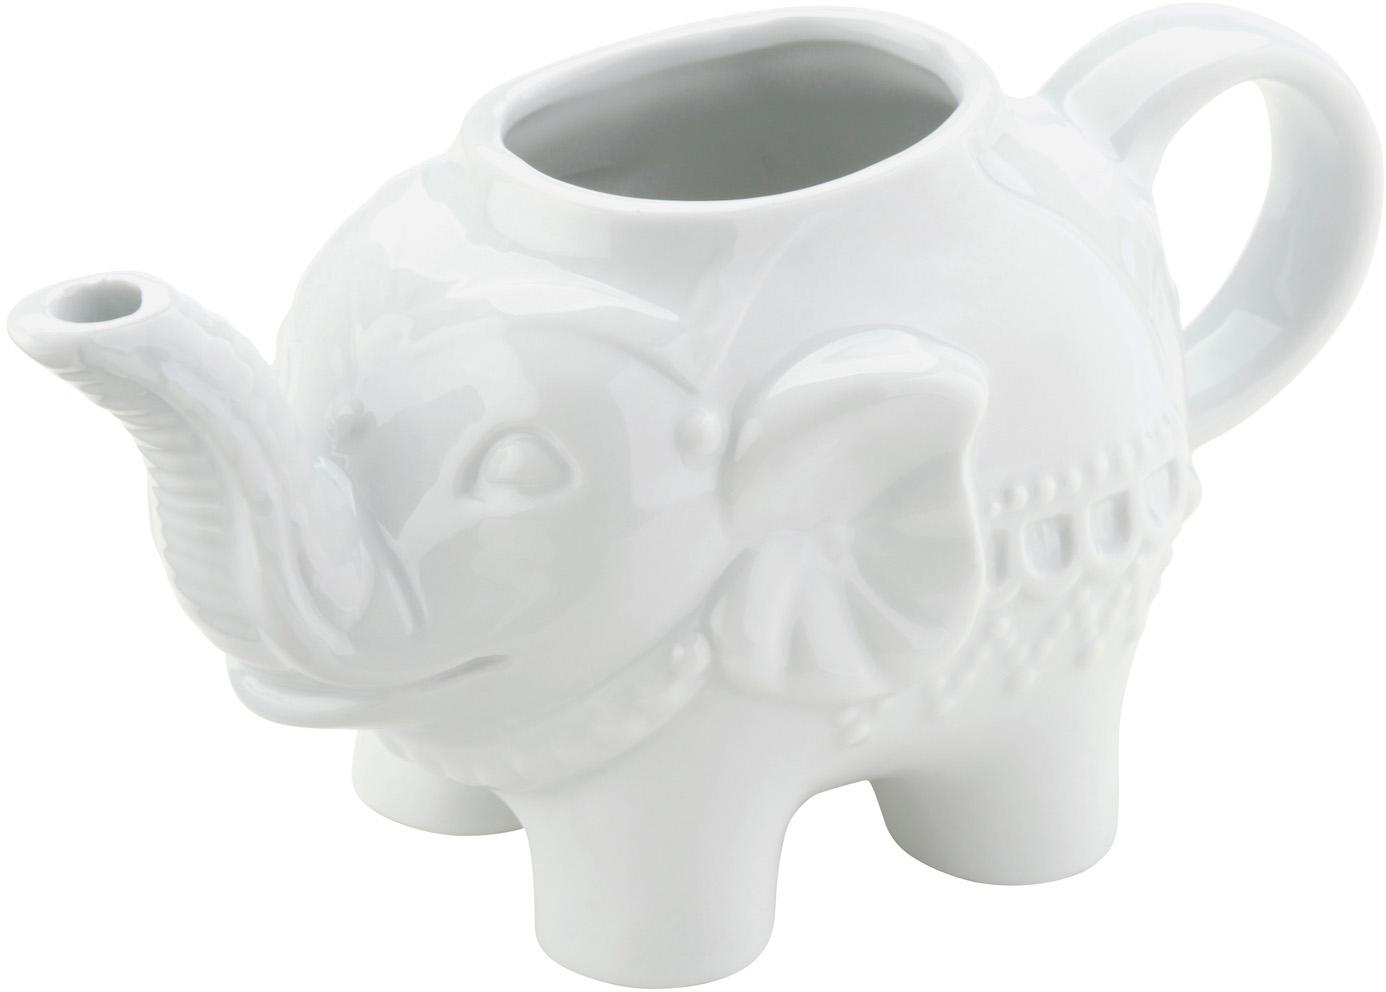 Brocca da latte Elephant, Porcellana, Bianco, L 15 x A 8 cm